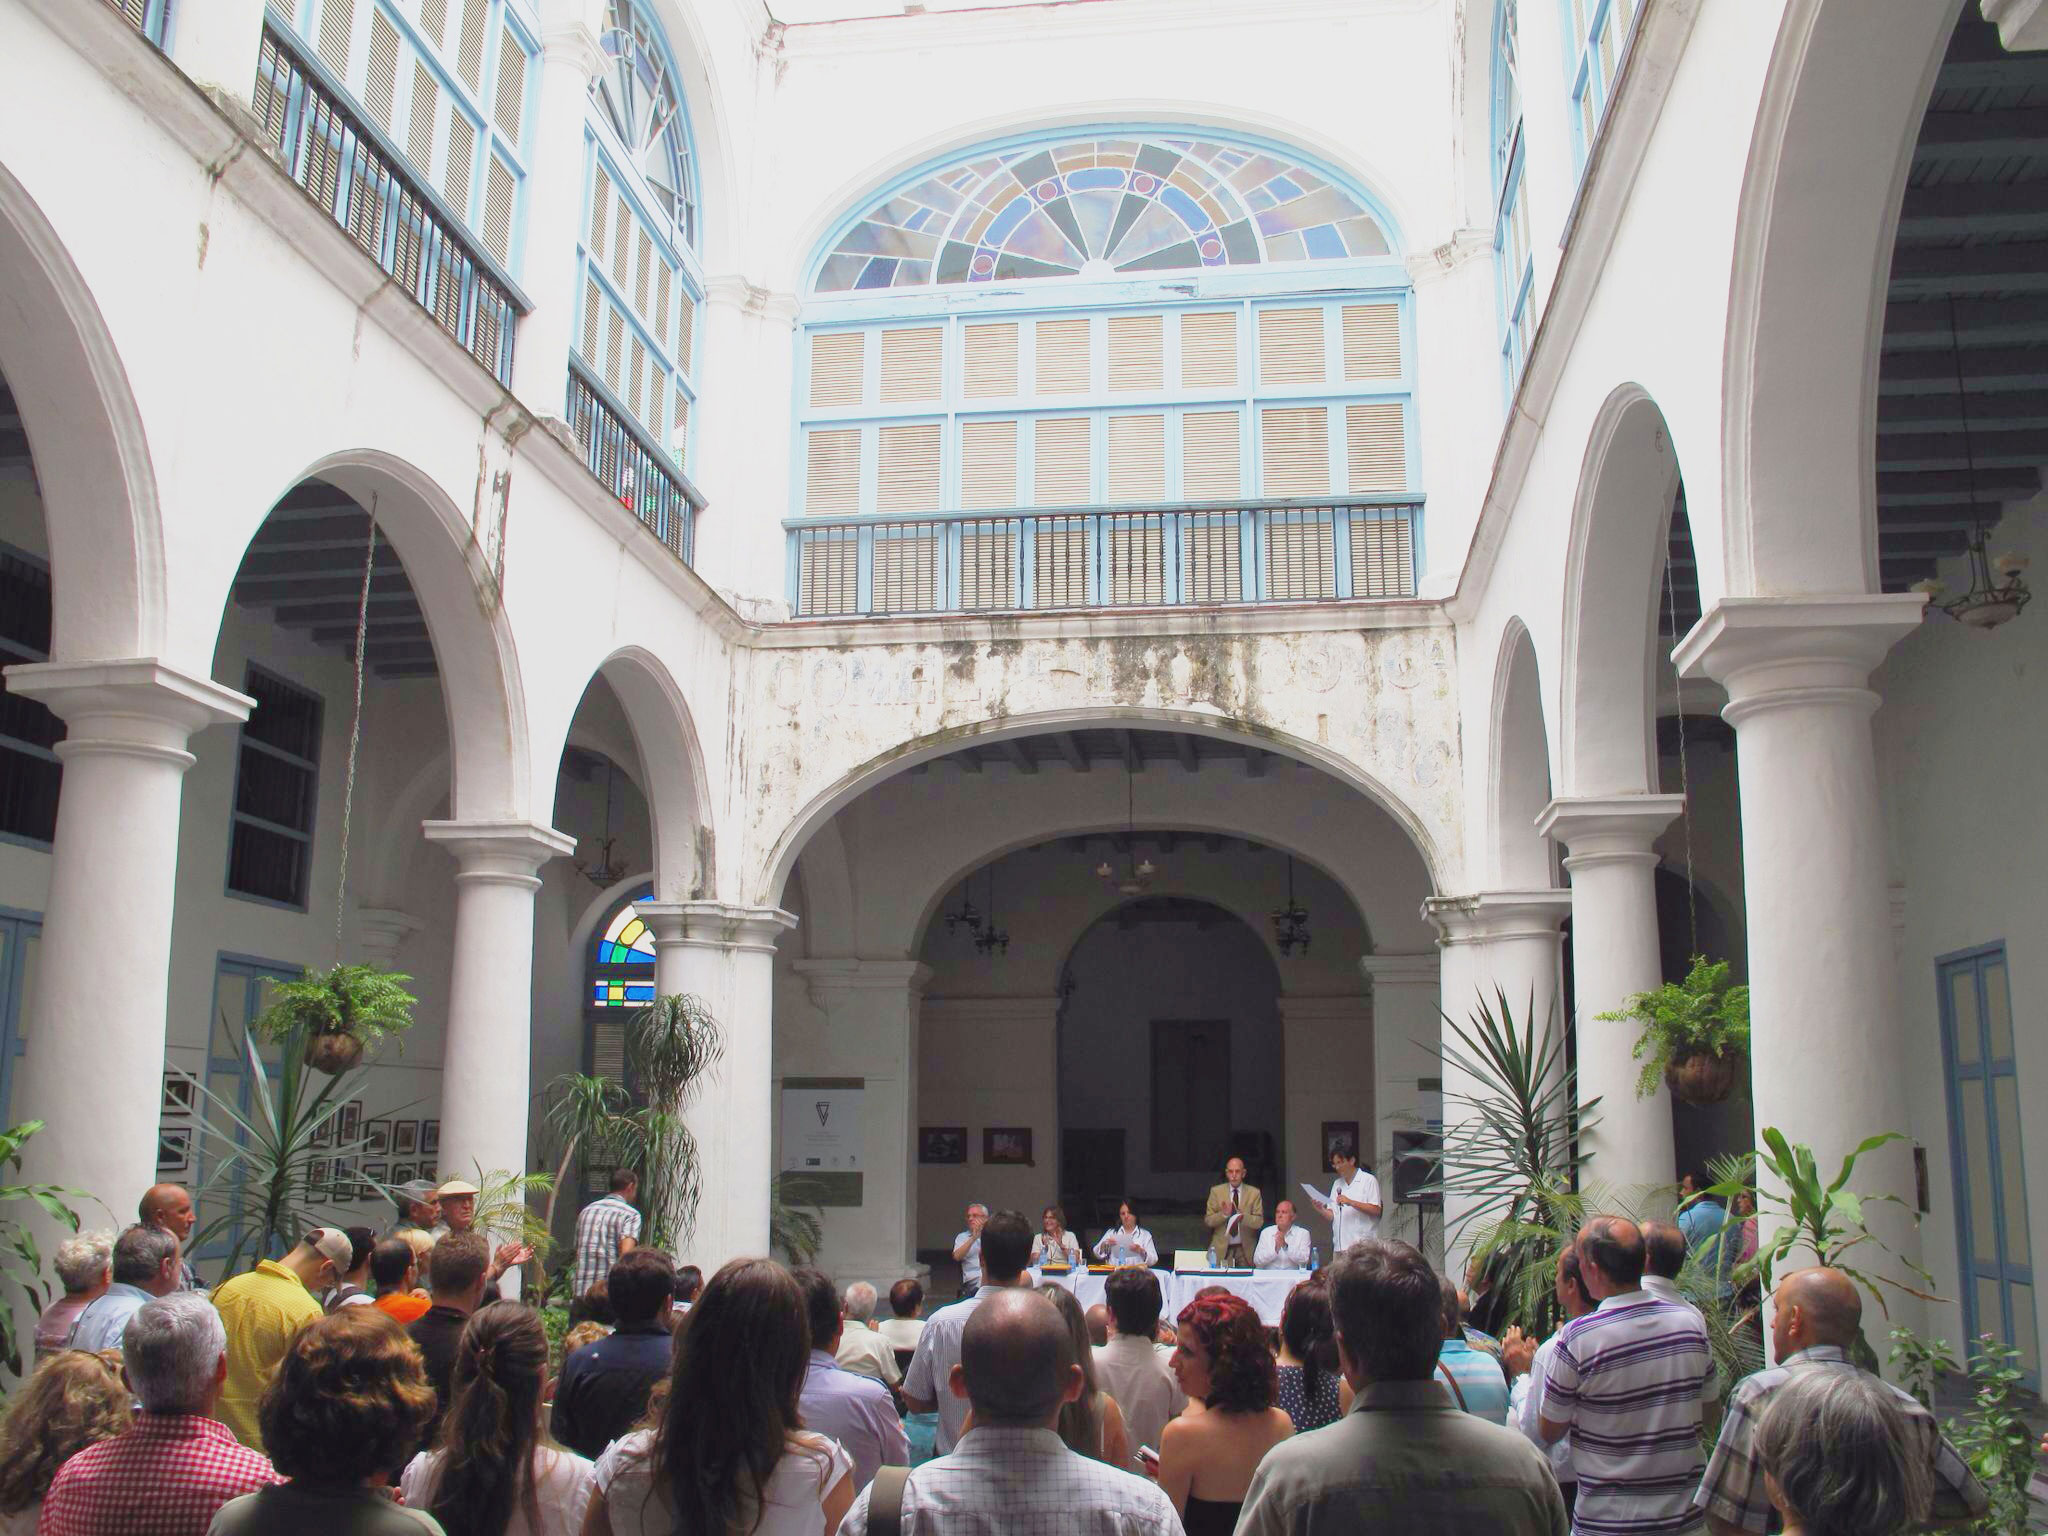 inauguracion_XI jornadas arquitectura vernacula gonzalo de cardenas_vitrina de valonia_casa de conde de canongo